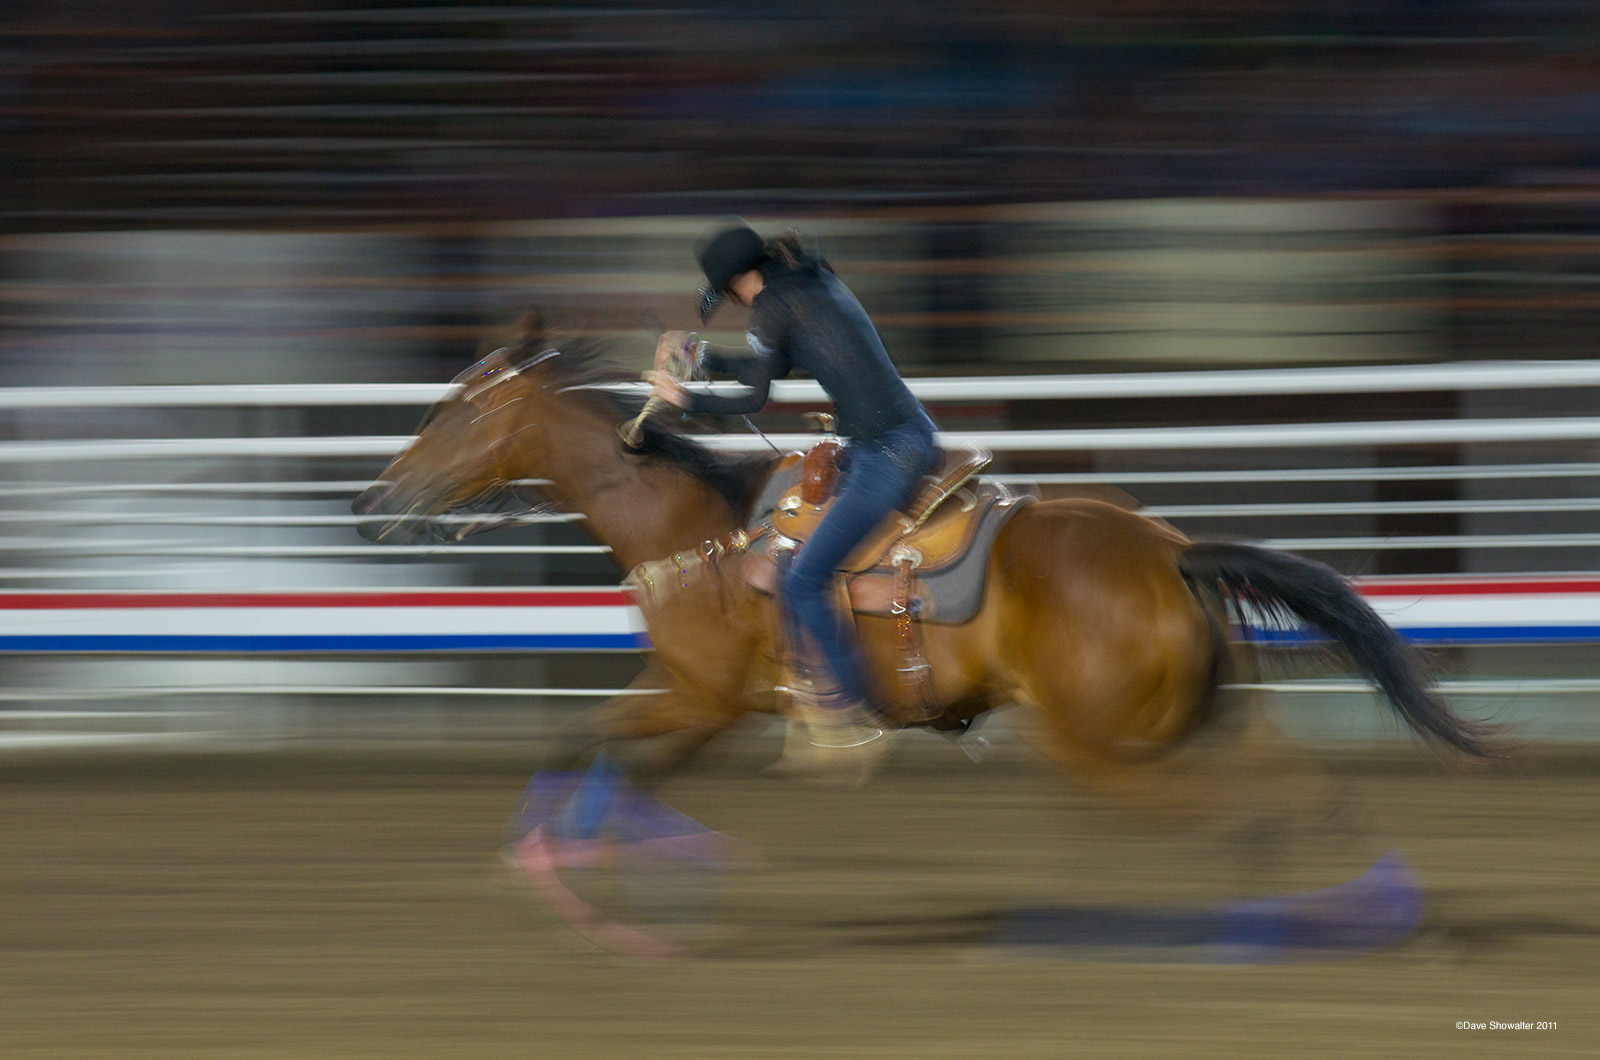 Cody nite rodeo, barrel race, photo